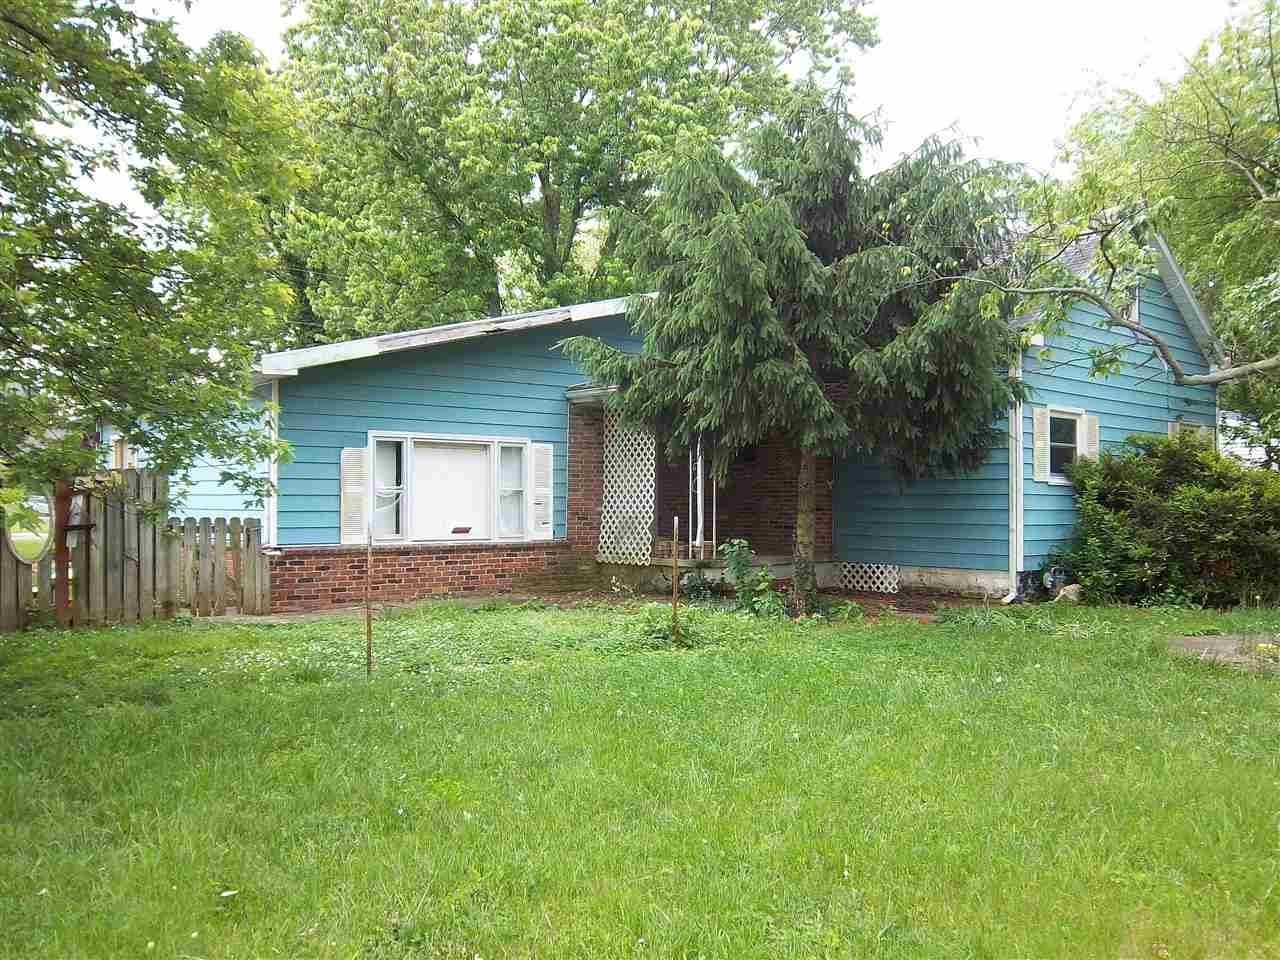 1302 Alvord Lane, Evansville, IN 47714